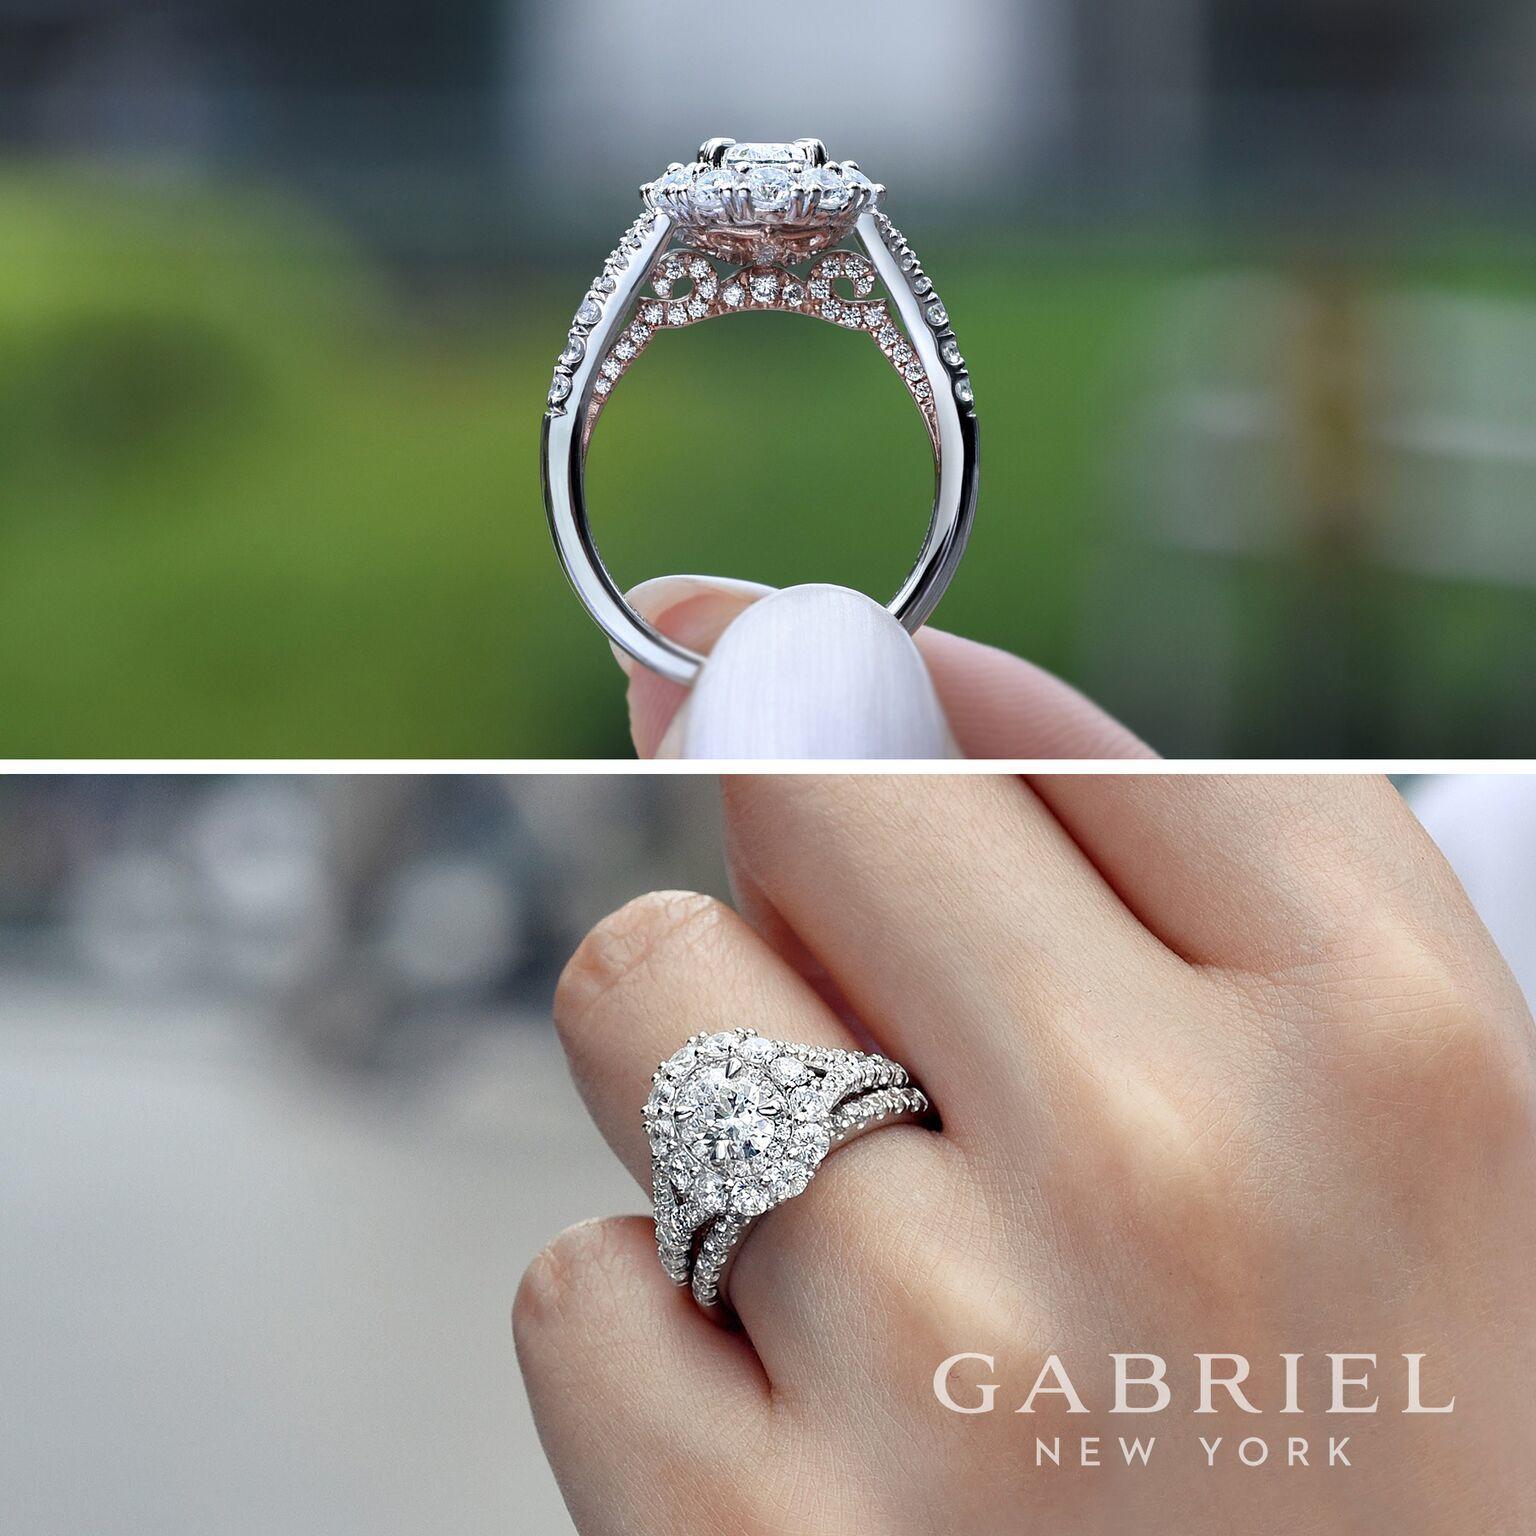 Emerald Lady Jewelry image 56